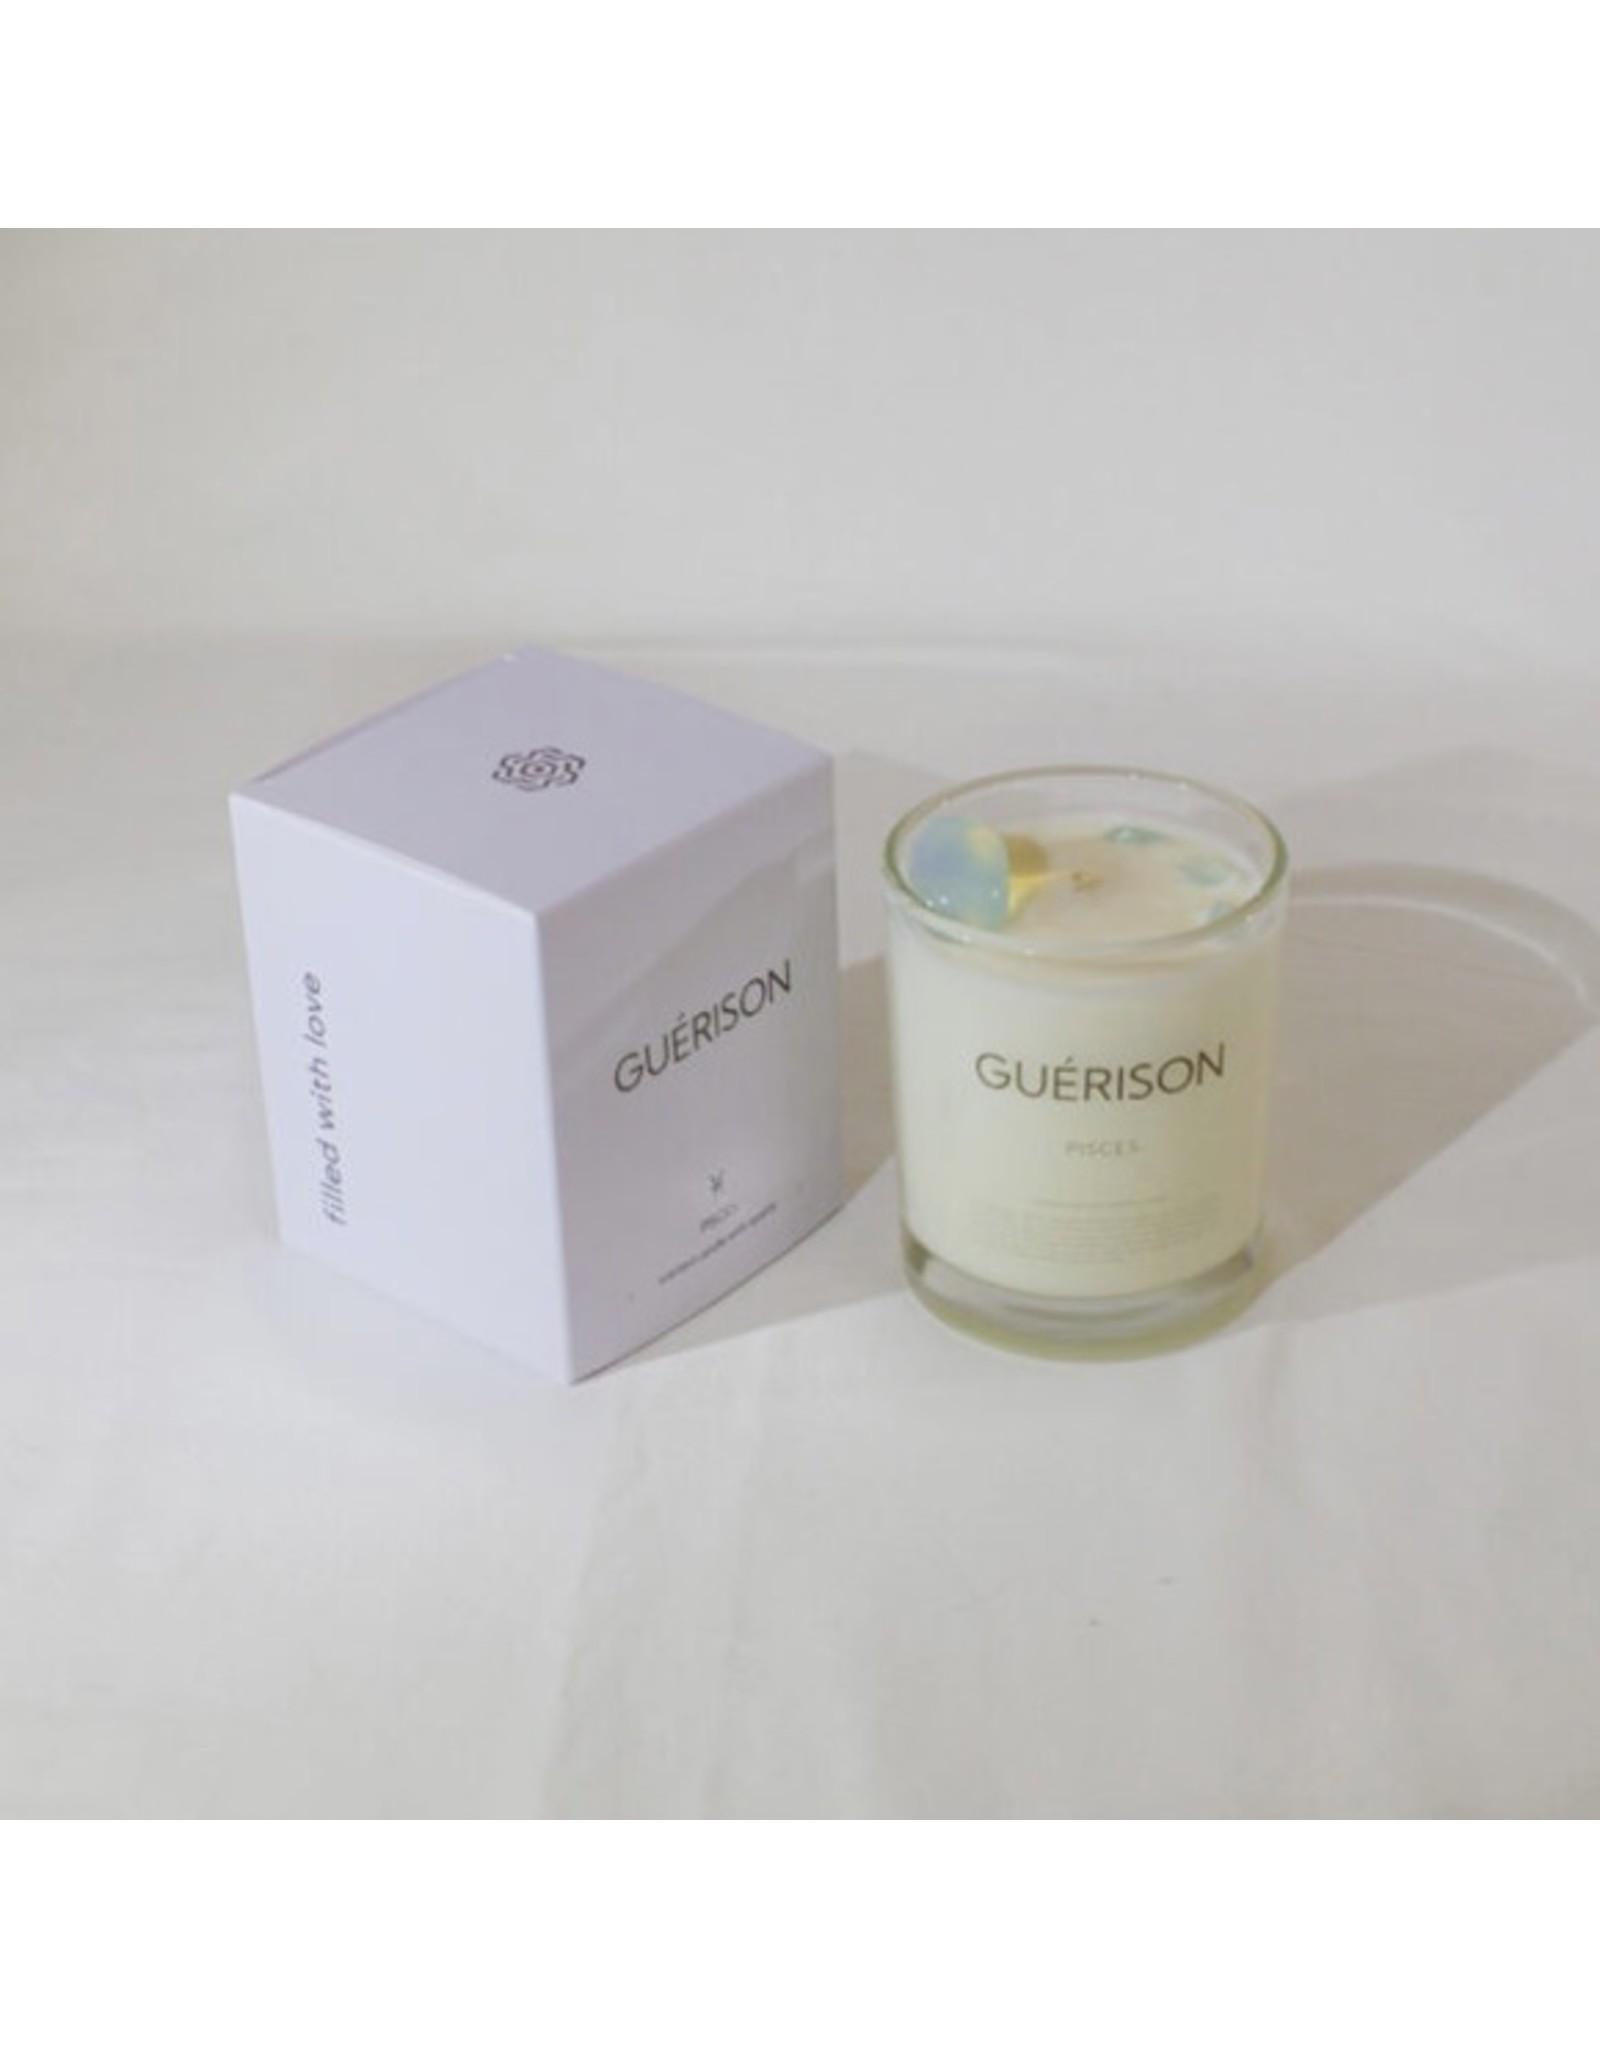 Guérison Pisces Candle, 220g